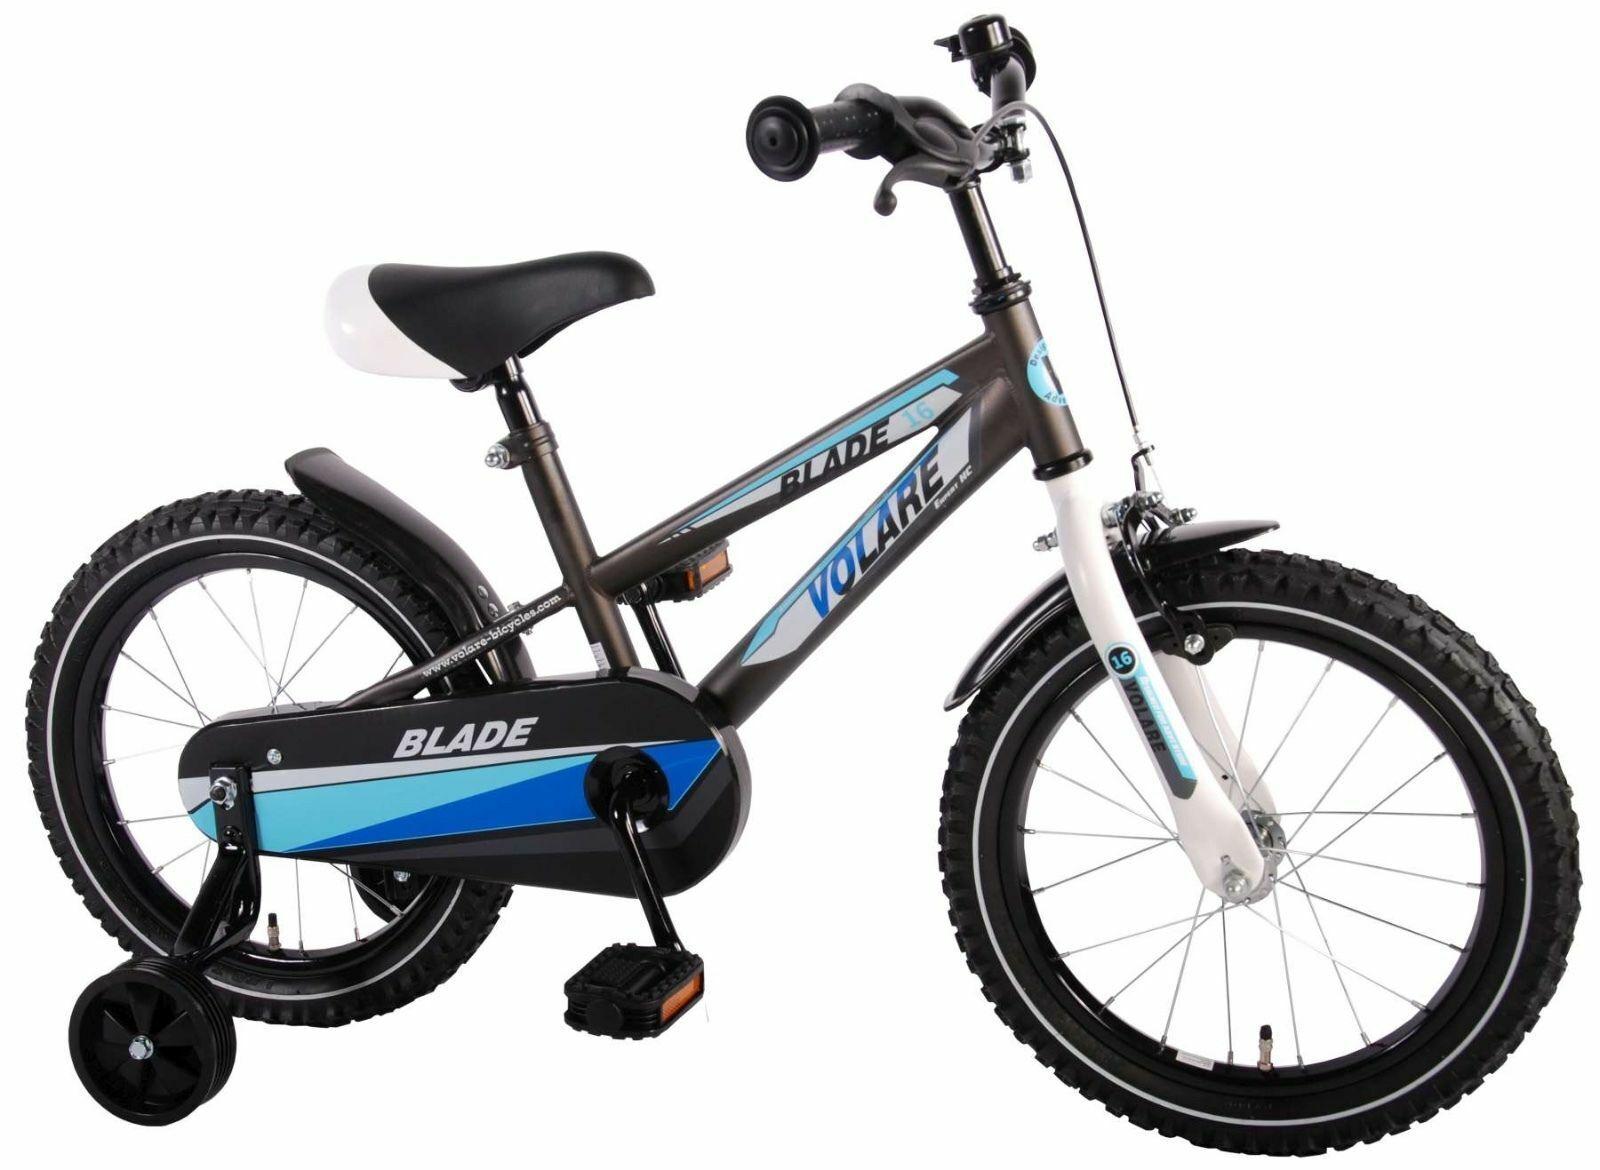 16 Zoll Fahrrad Qualitäts Kinderfahrrad mit Stützräder Blade Grau Grau Grau Matt 61631 4c9acd